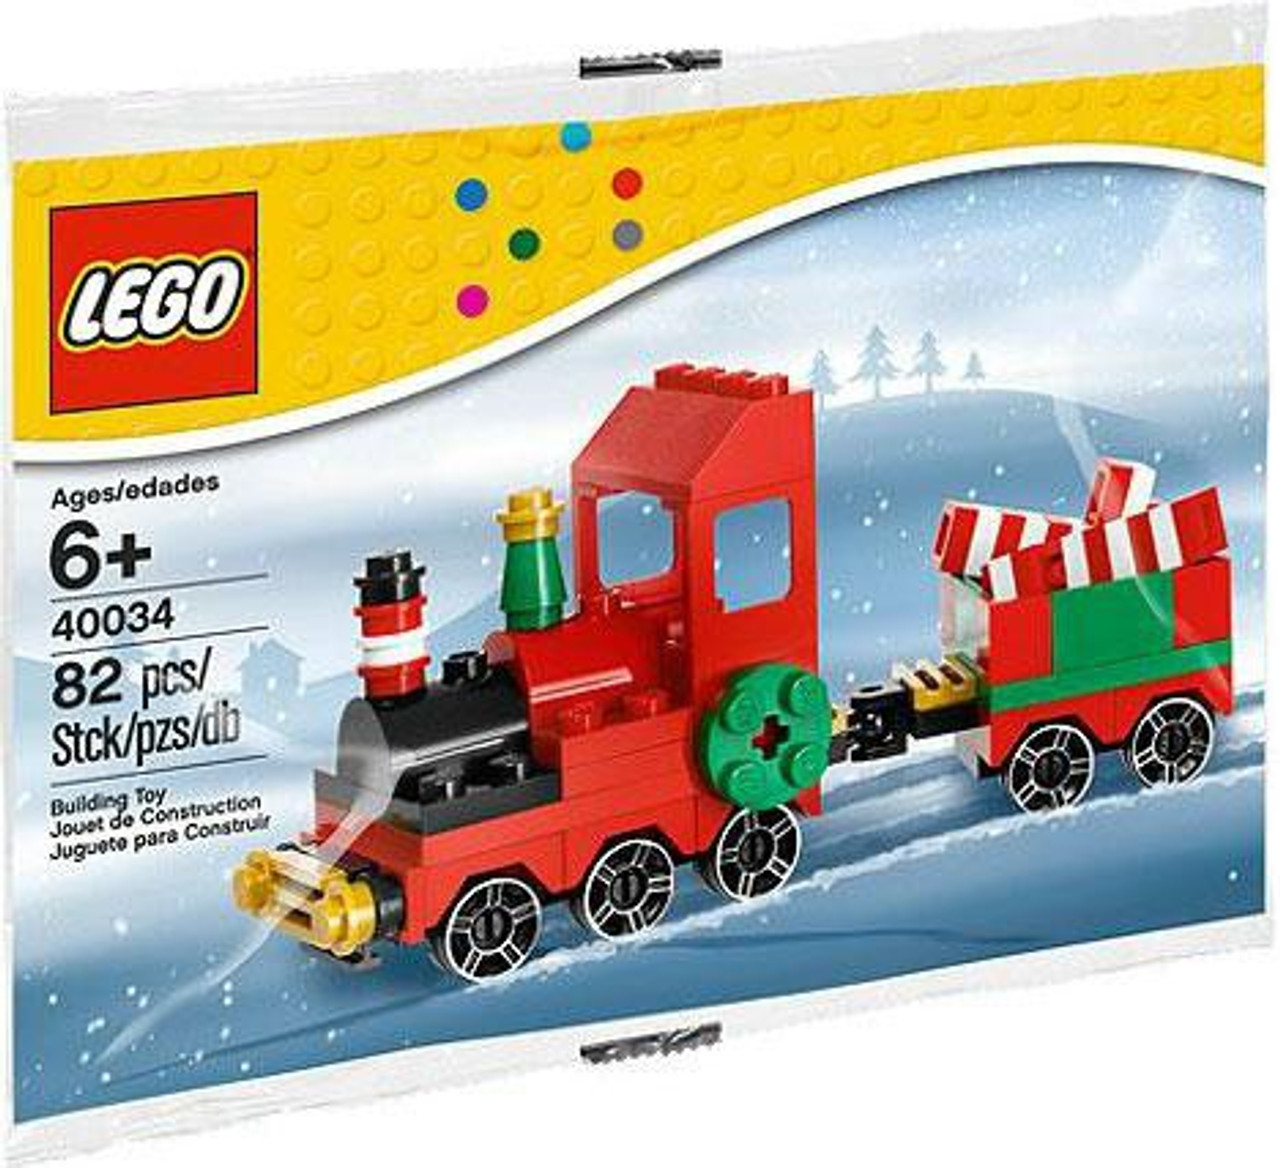 Lego Christmas Train.Lego Christmas Train Mini Set 40034 Bagged